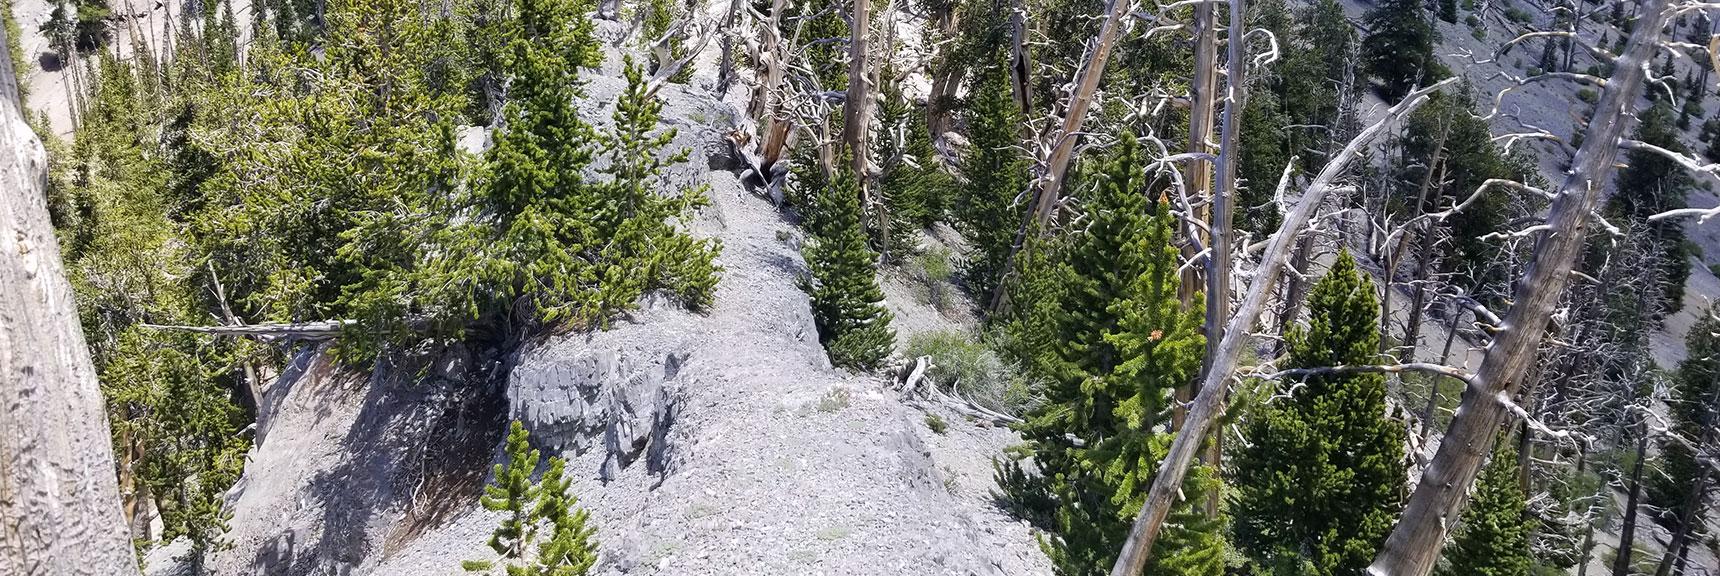 Narrow Cat Walk on Cutoff Ridge Between Upper North Loop Train and Mummy Mountain